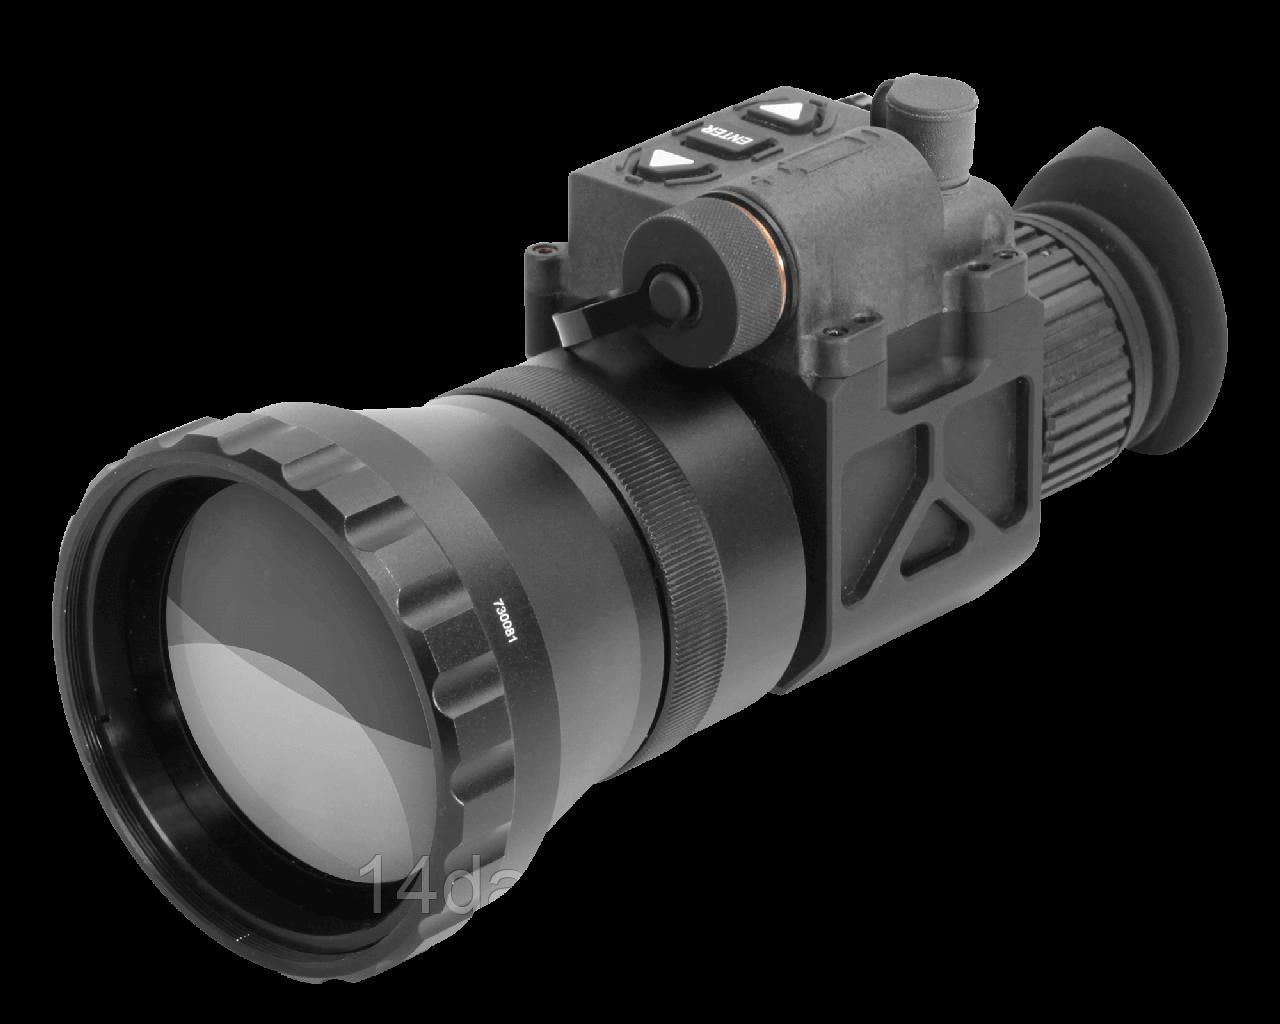 Тепловизор ATN OTS-X-S670